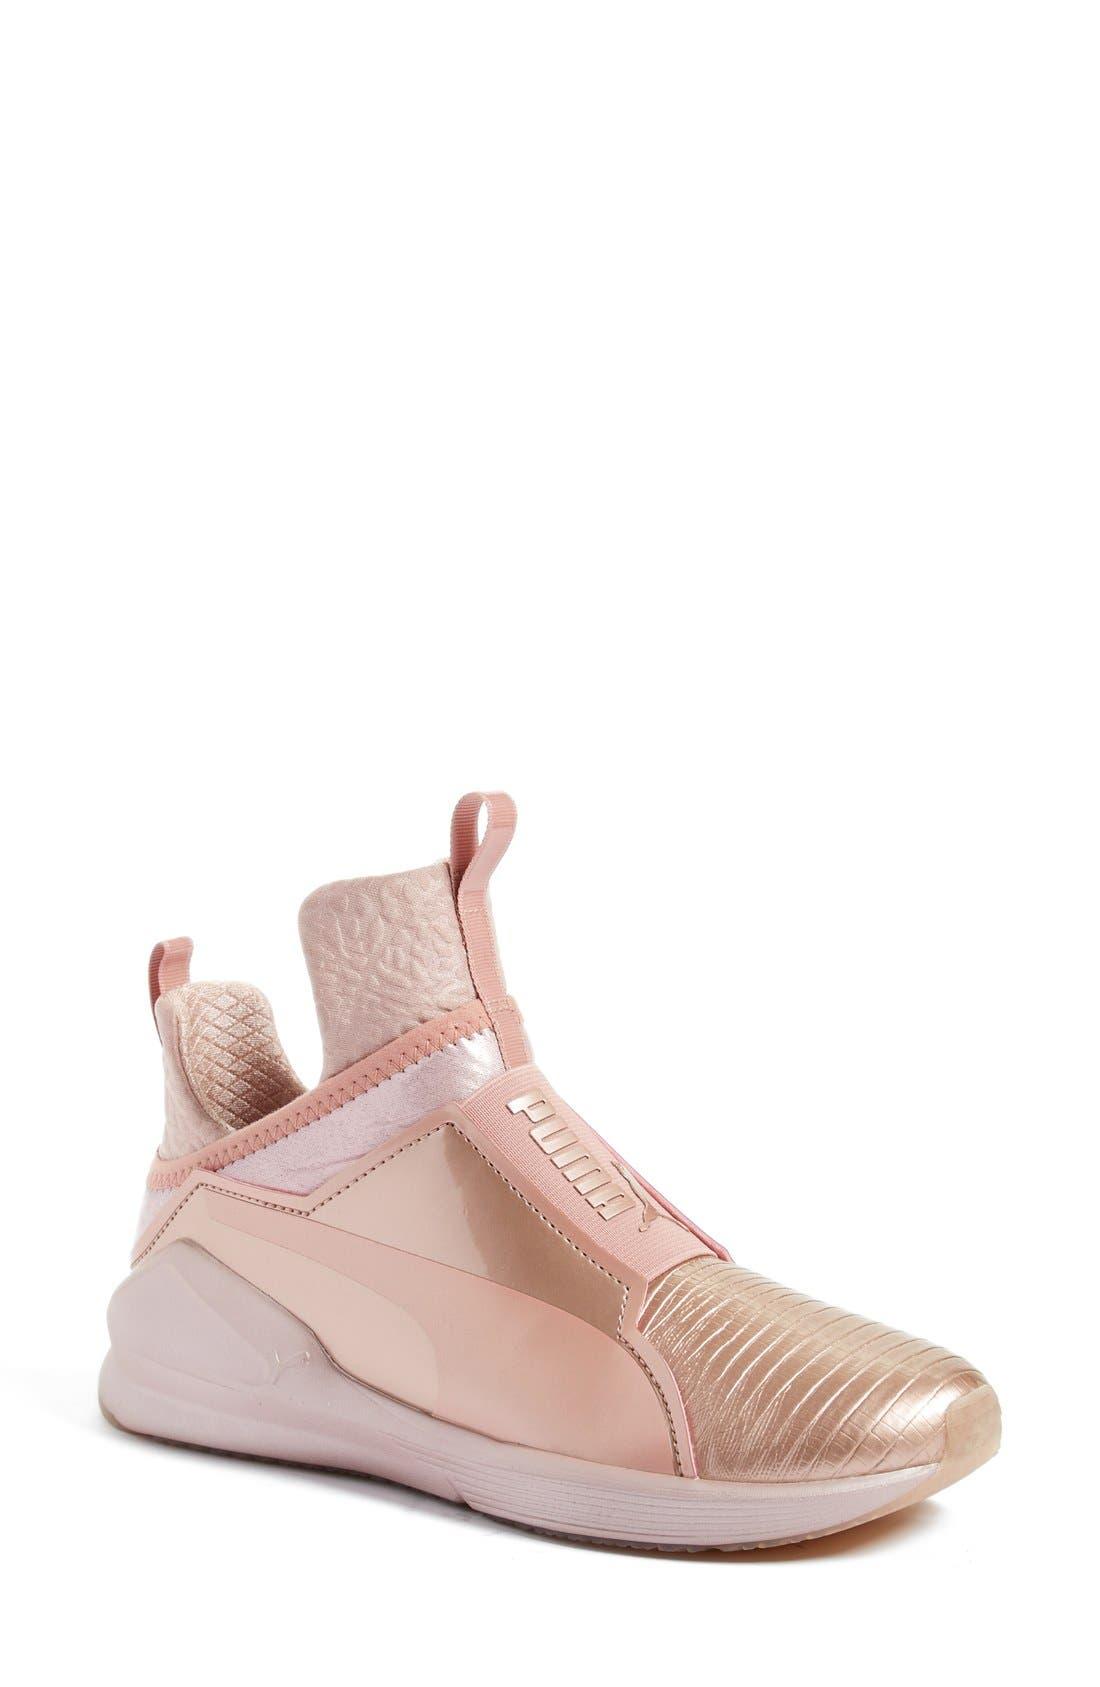 Fierce Metallic High Top Sneaker,                             Main thumbnail 1, color,                             Rose Gold